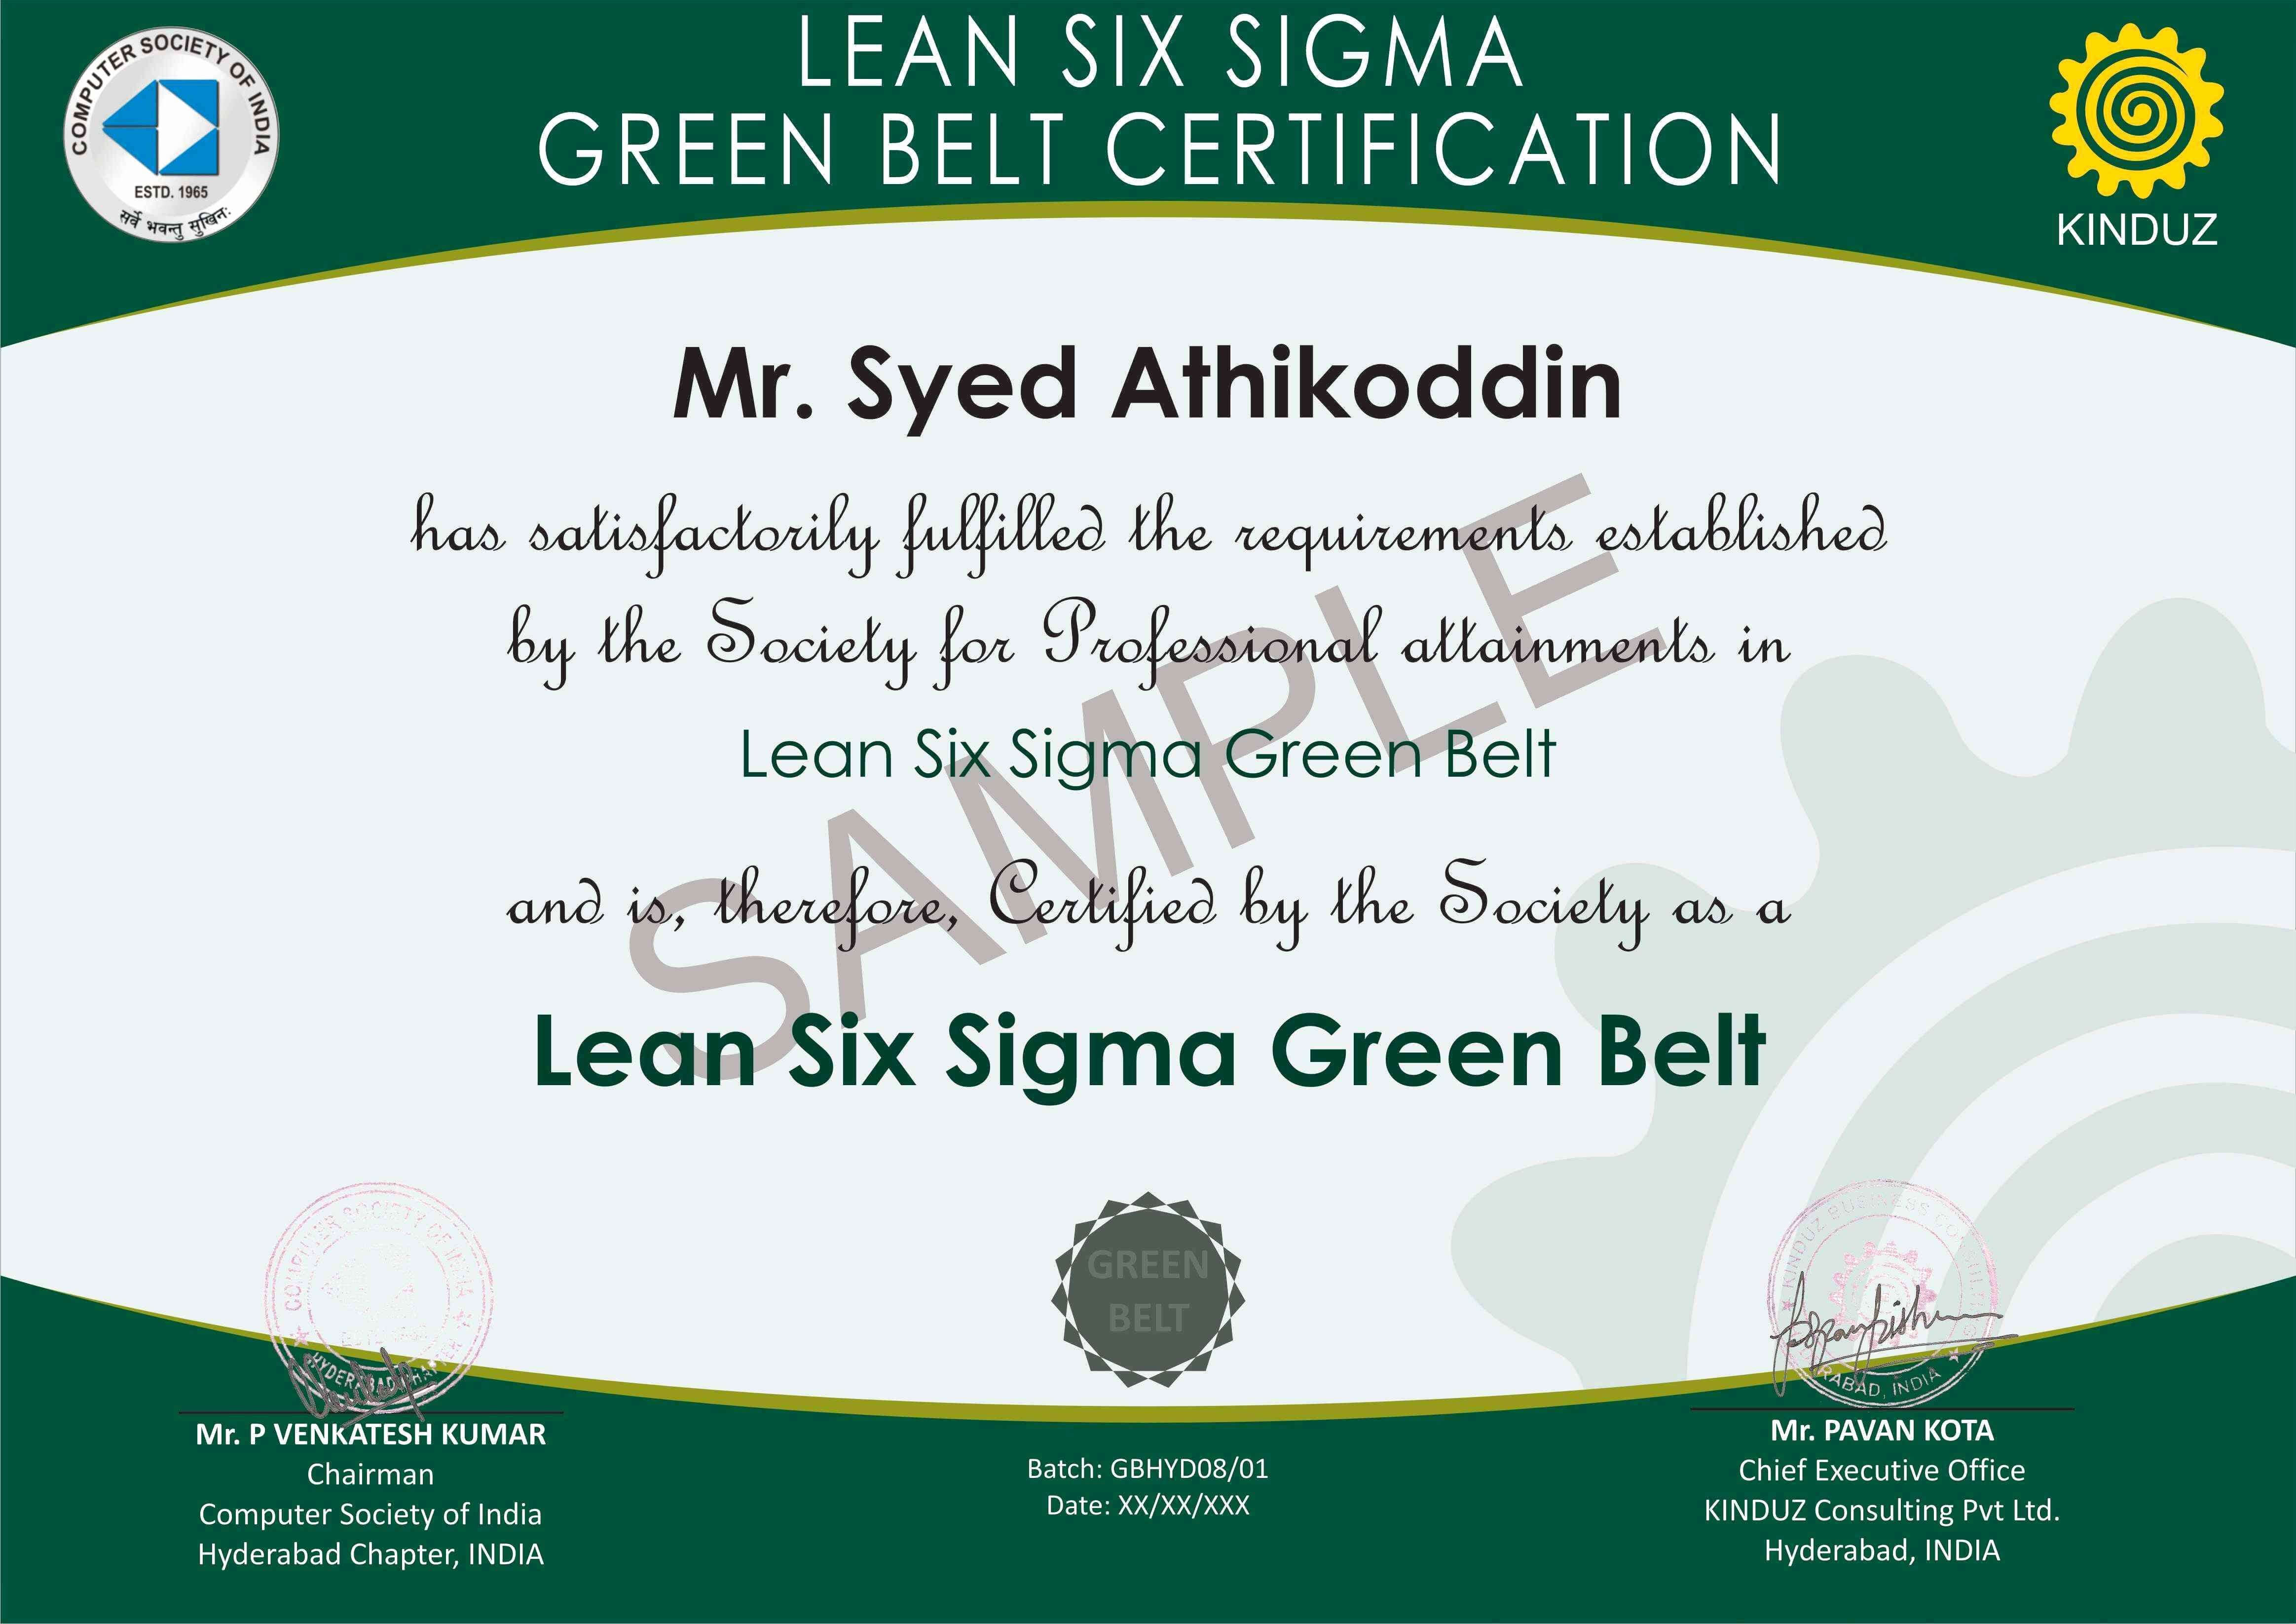 30 Free Black Belt Certificate Template | Pryncepality With Green Belt Certificate Template